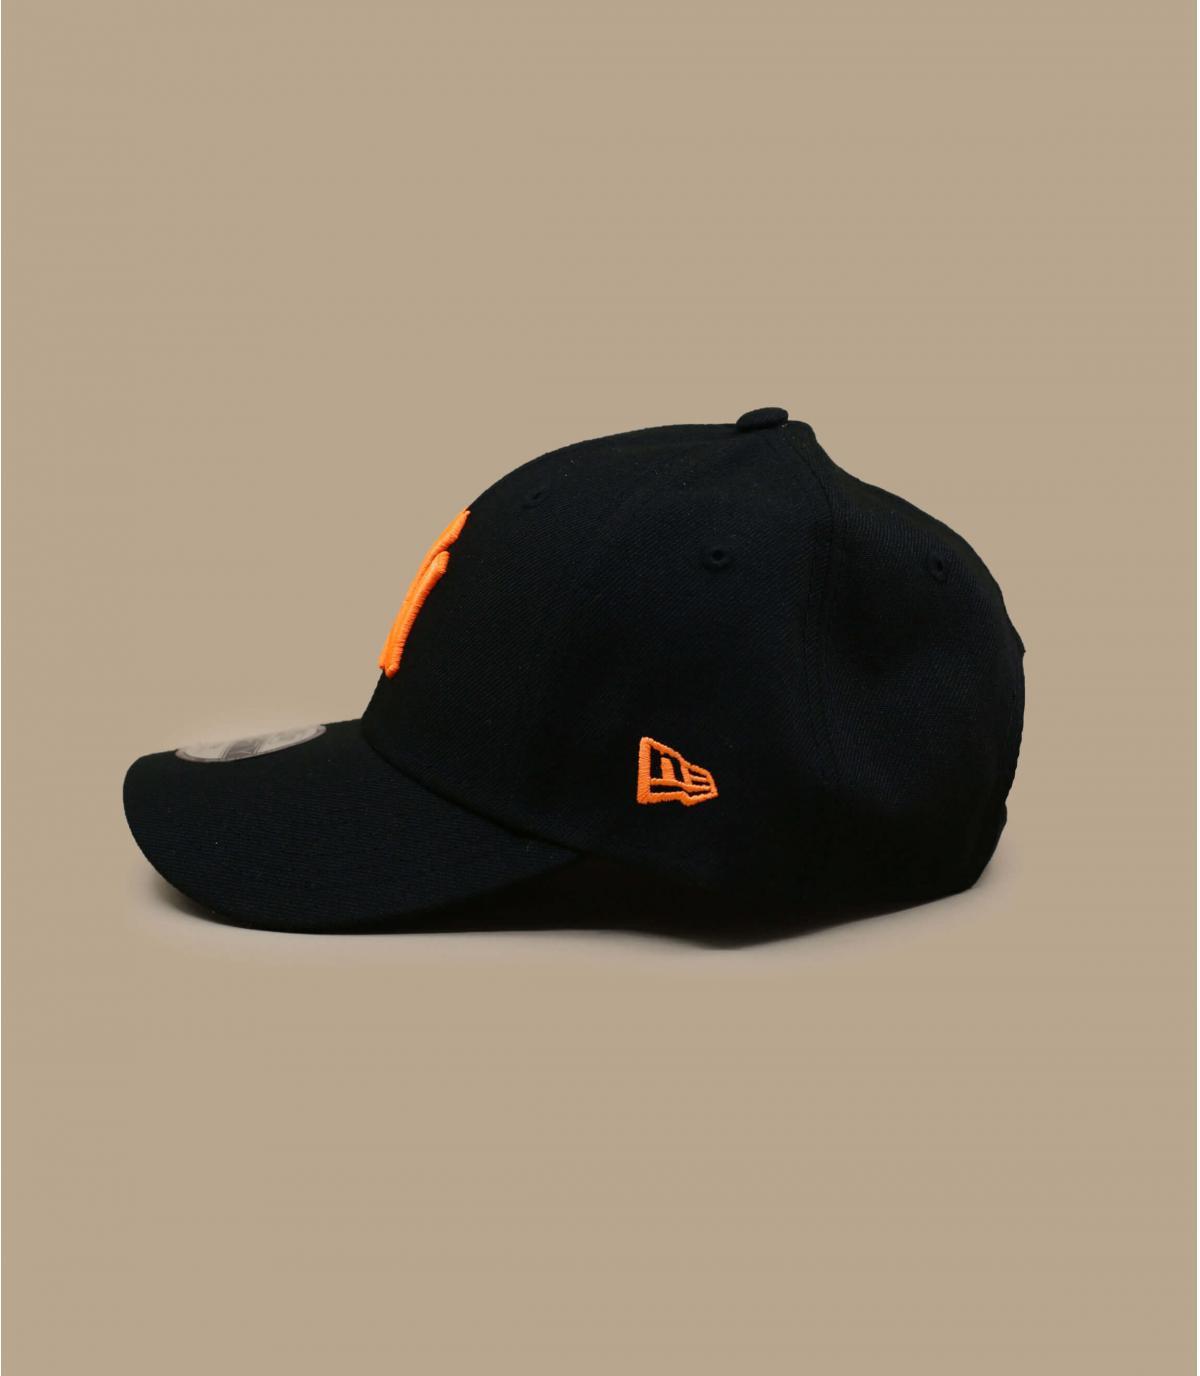 Détails Kids Neon Pack NY 940 black orange - image 3